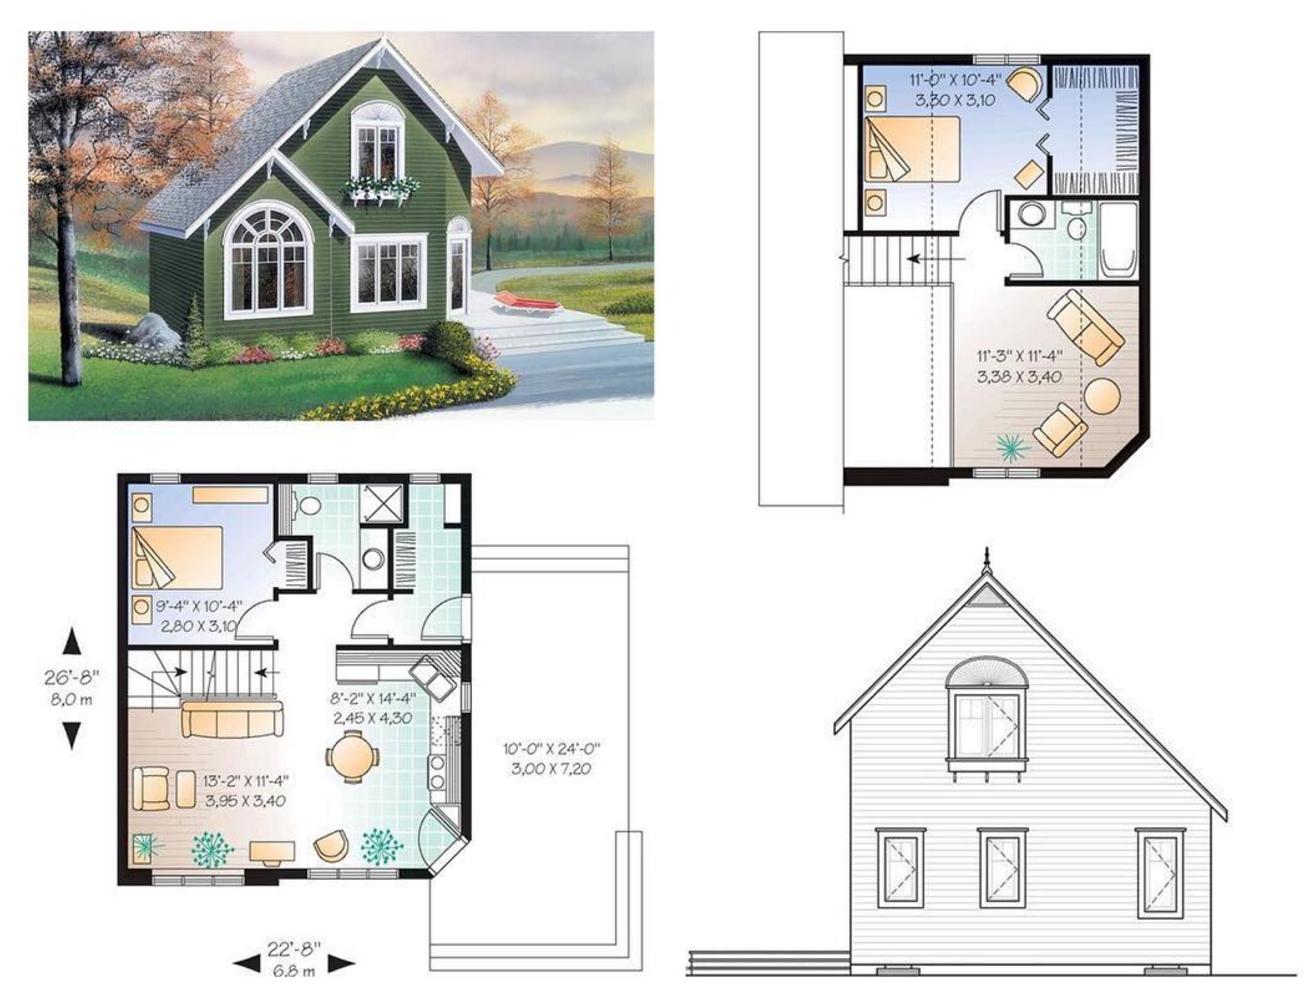 101 planos de casas: Planos de casas de 2 plantas pequeñas